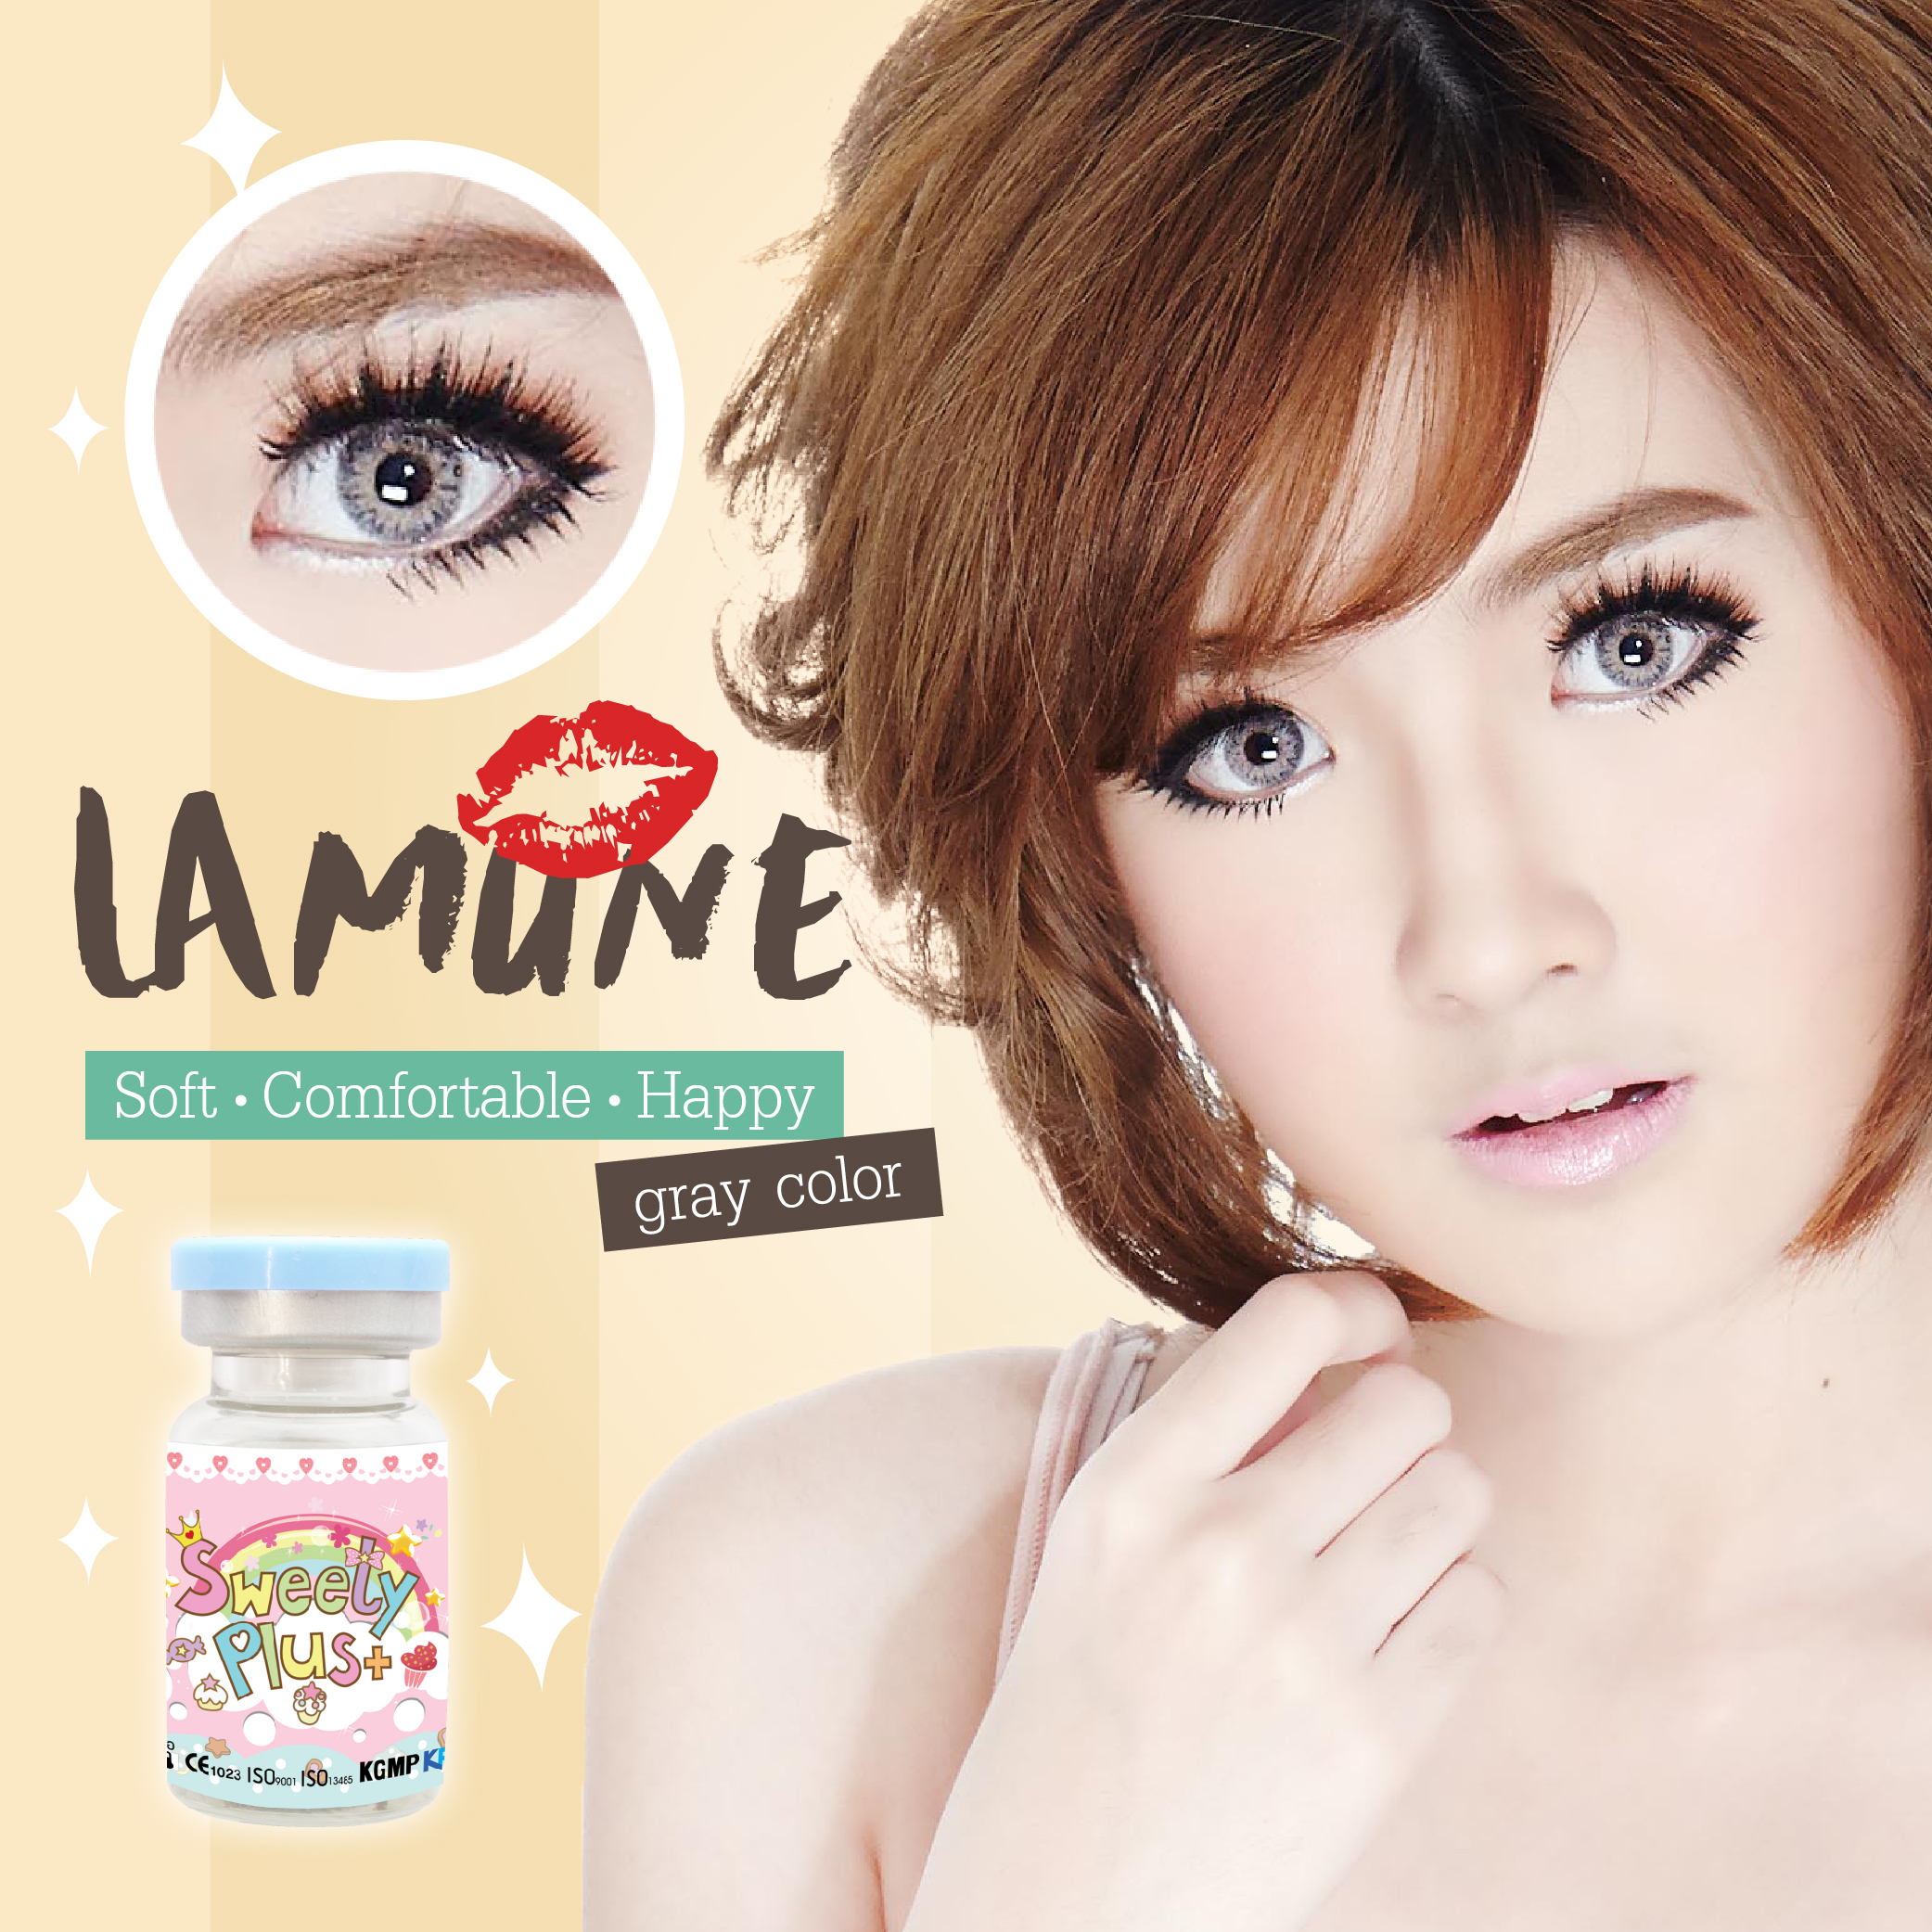 Lamune - gray